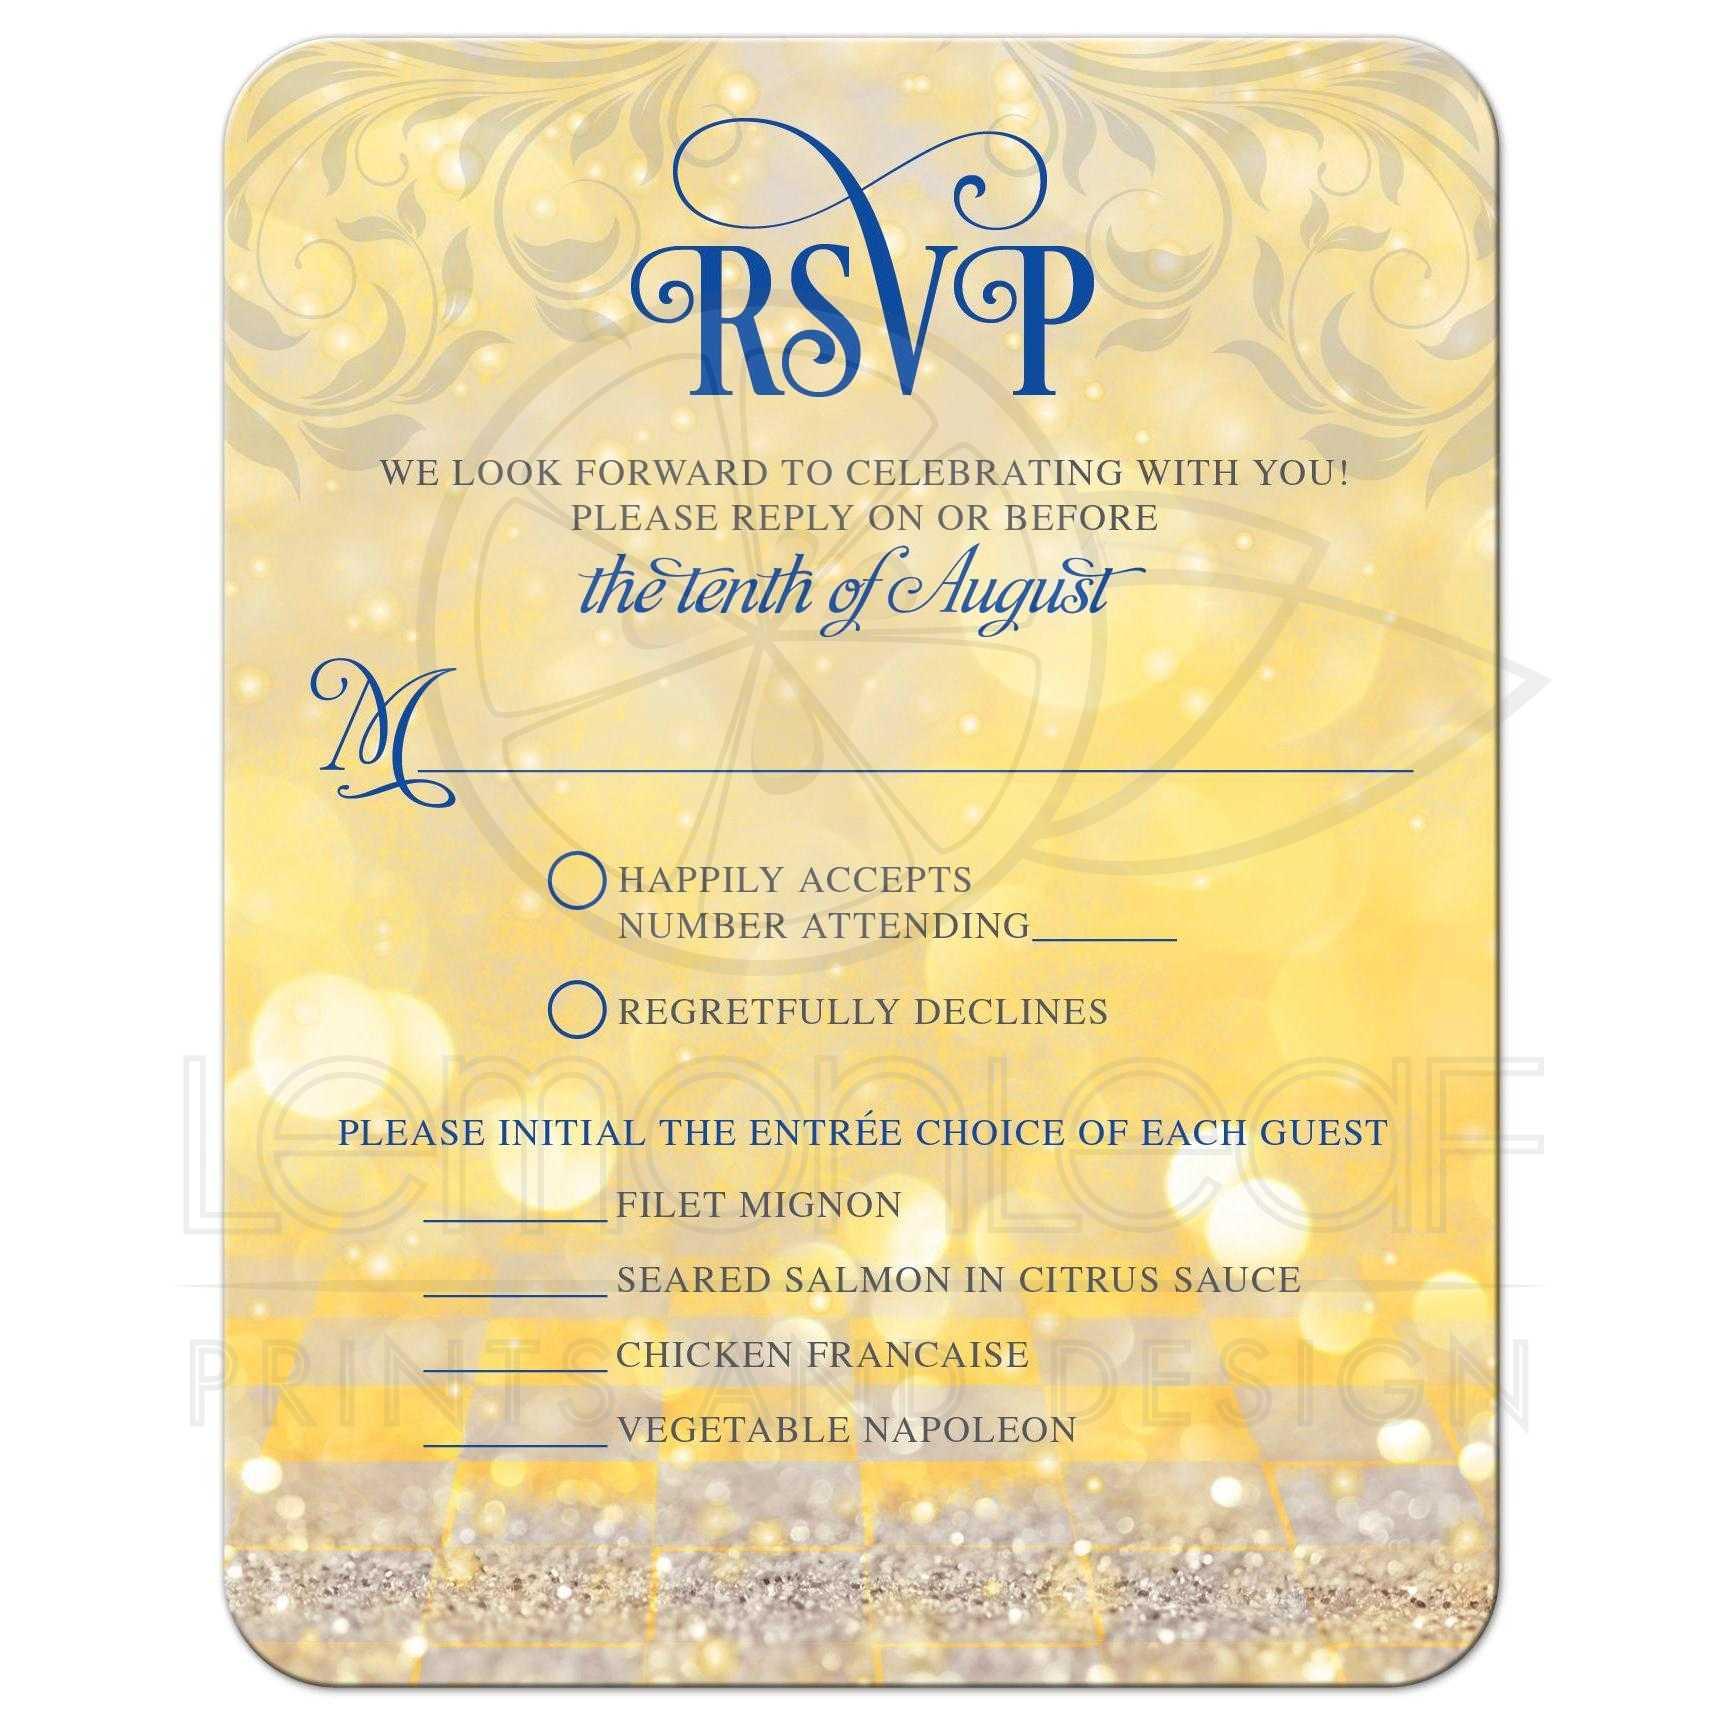 Real Fairytale Weddings Silver Spring Md: Fairy Tale Wedding Meal Choice RSVP Card Royal Blue Gold